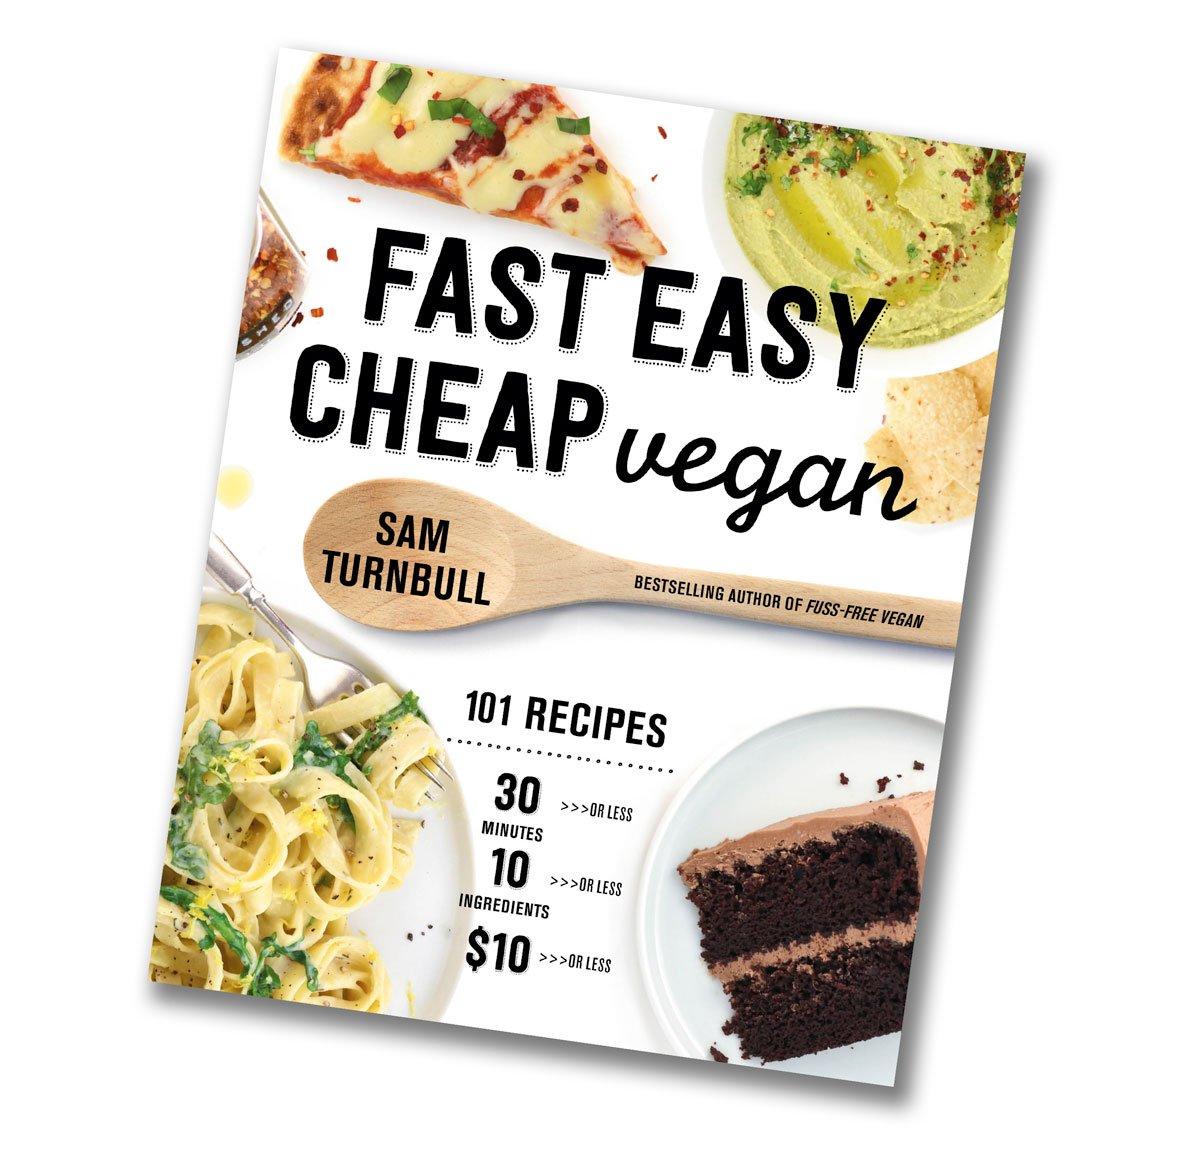 Fast Easy Cheap Vegan cookbook cover